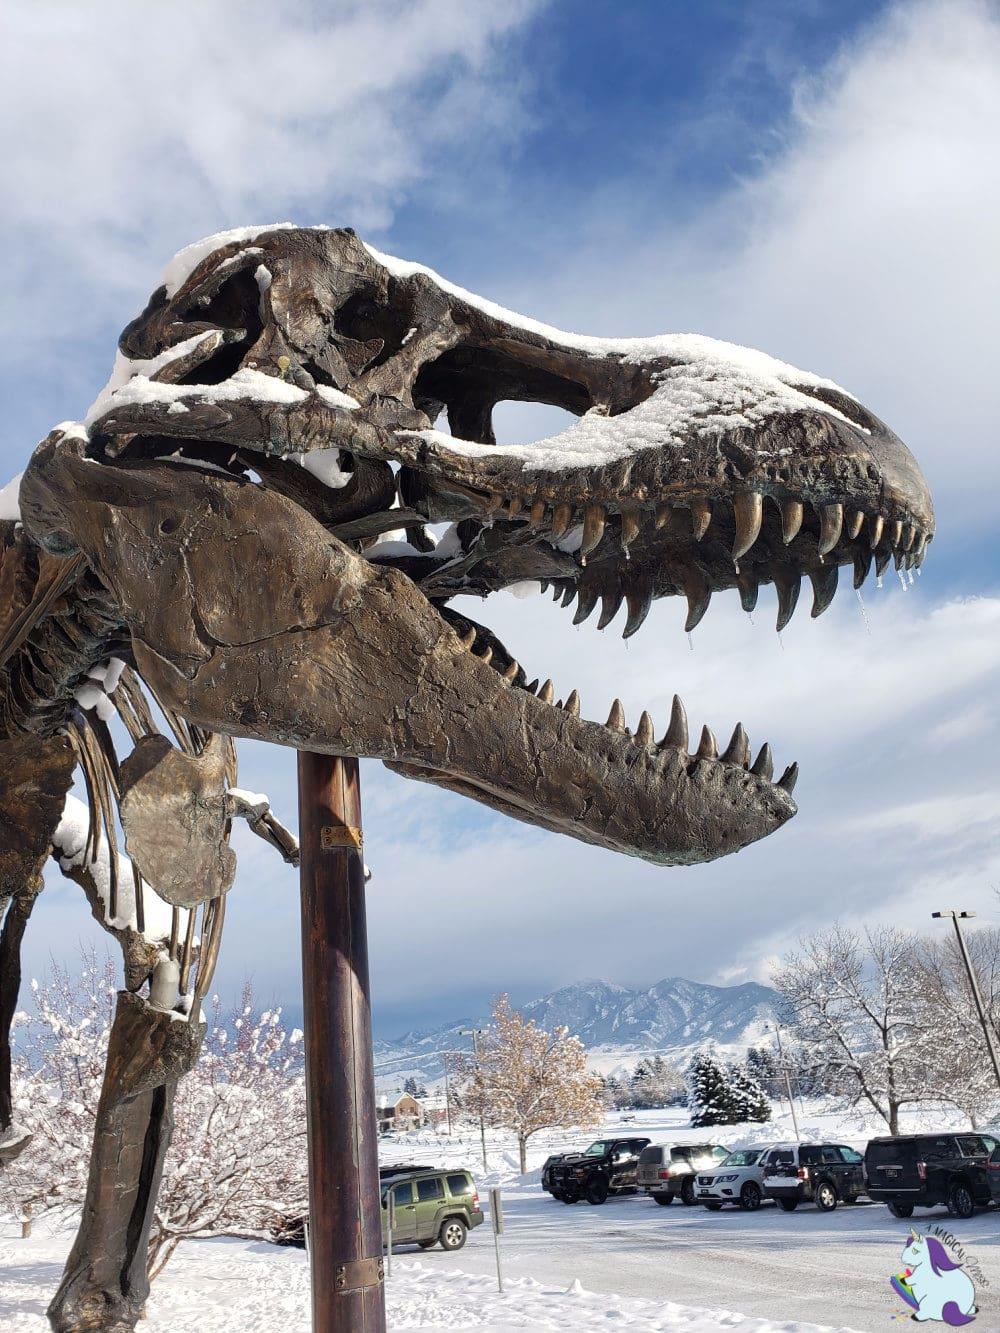 T Rex skeleton at Museum of the Rockies